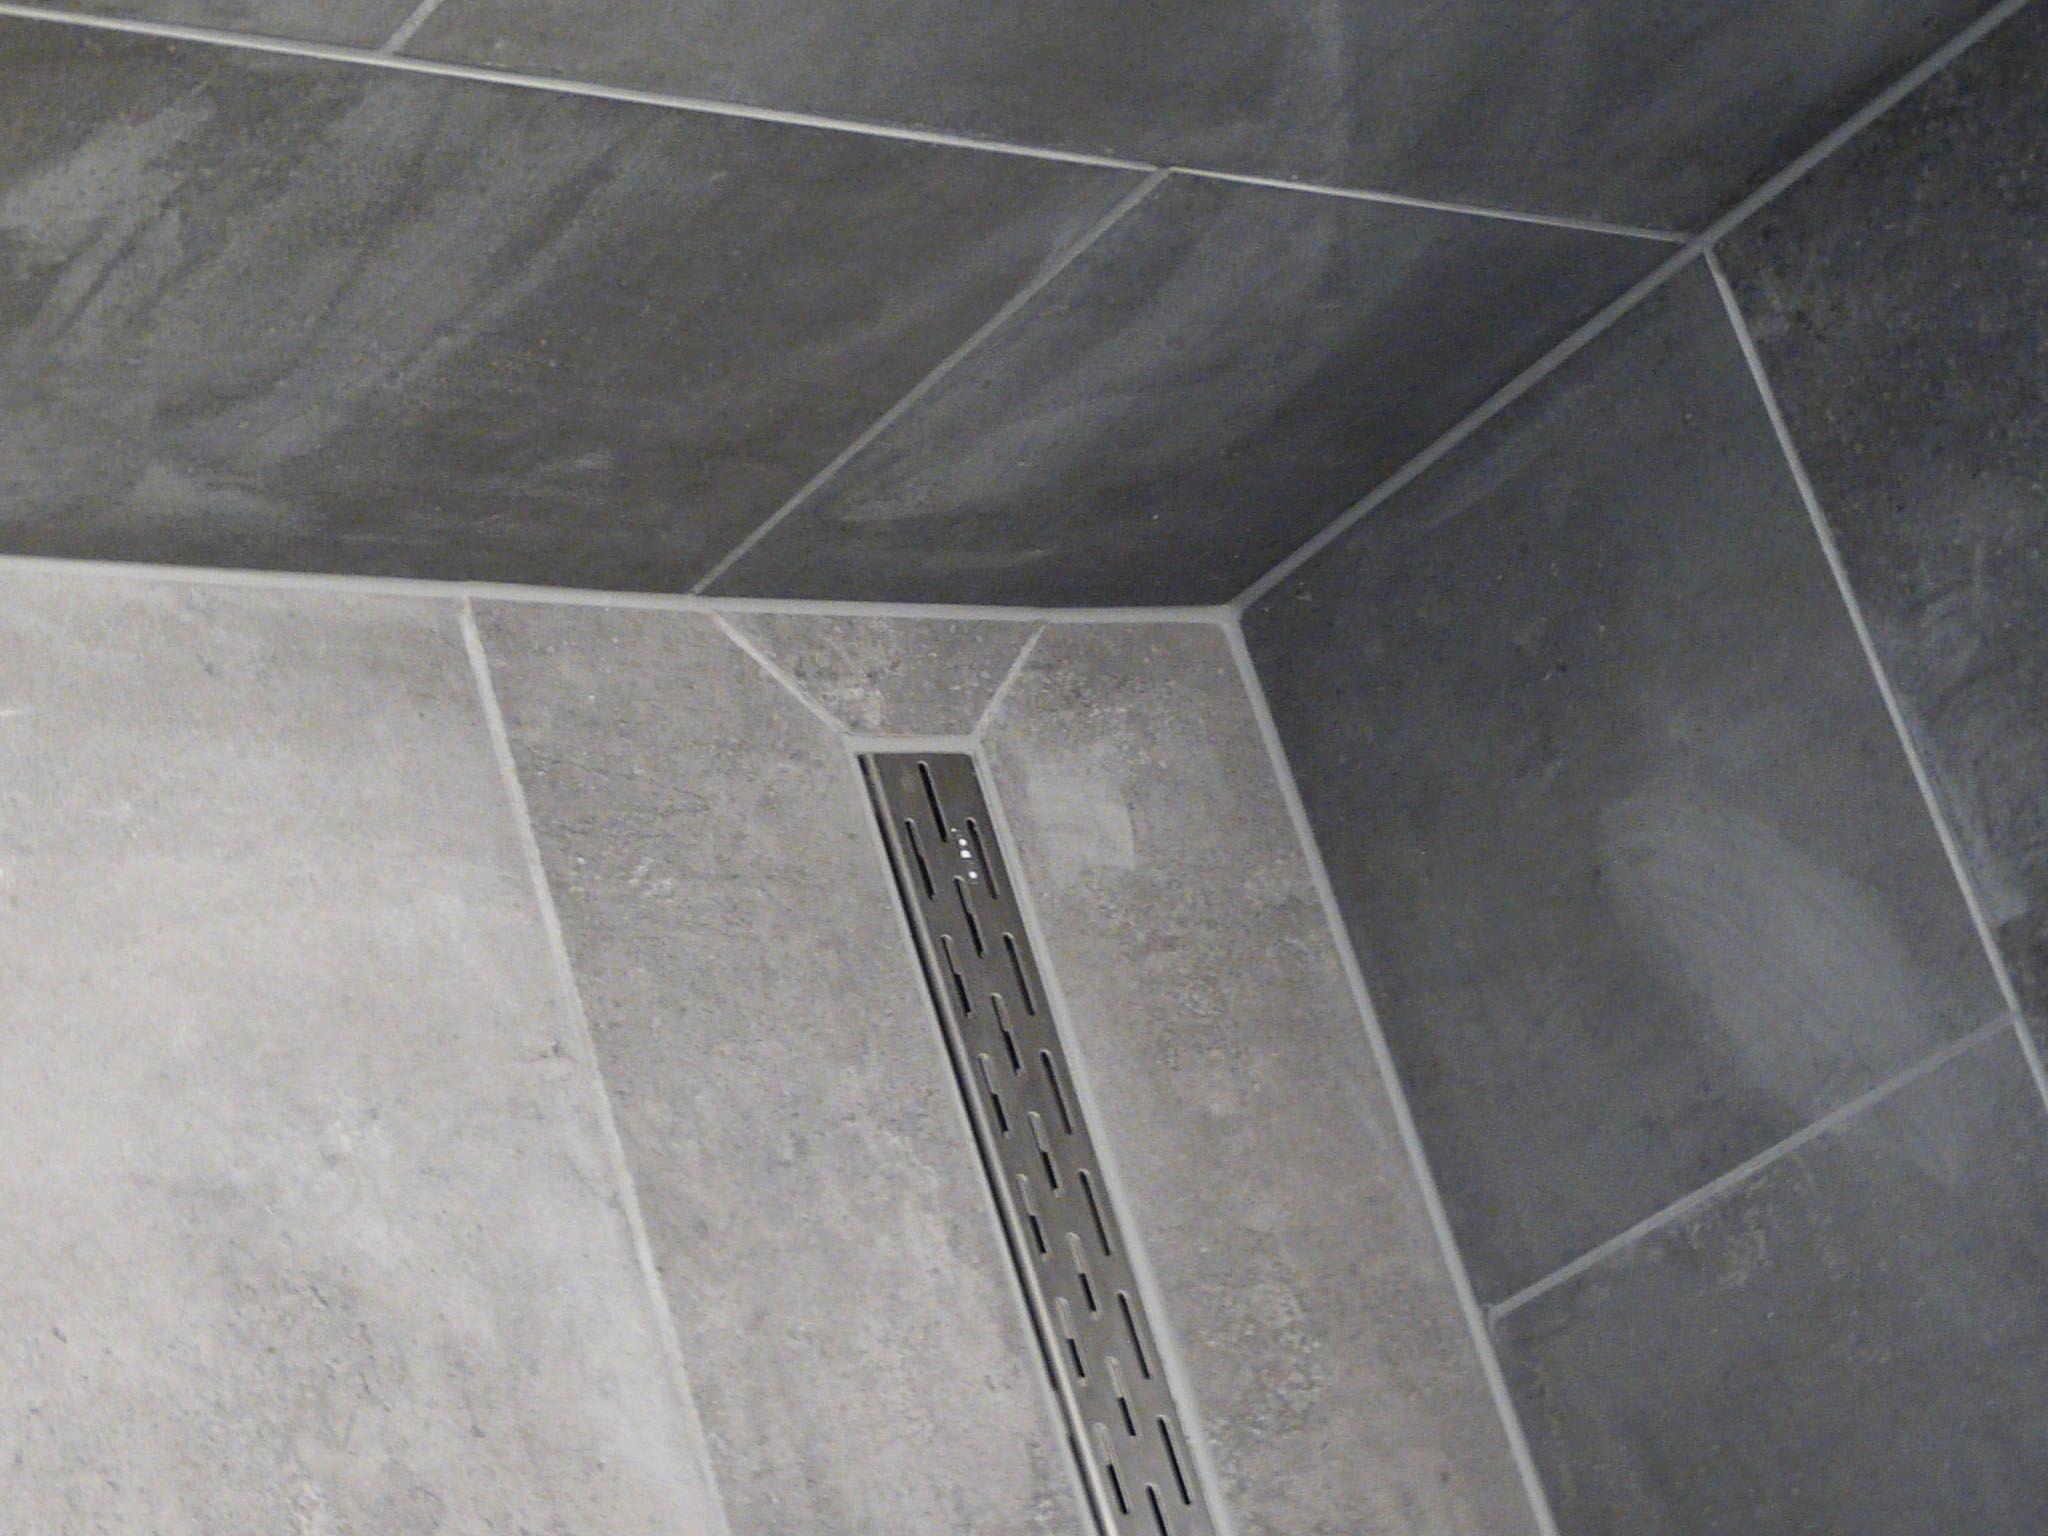 Vloer-drain aansluiting   badkamer   Pinterest